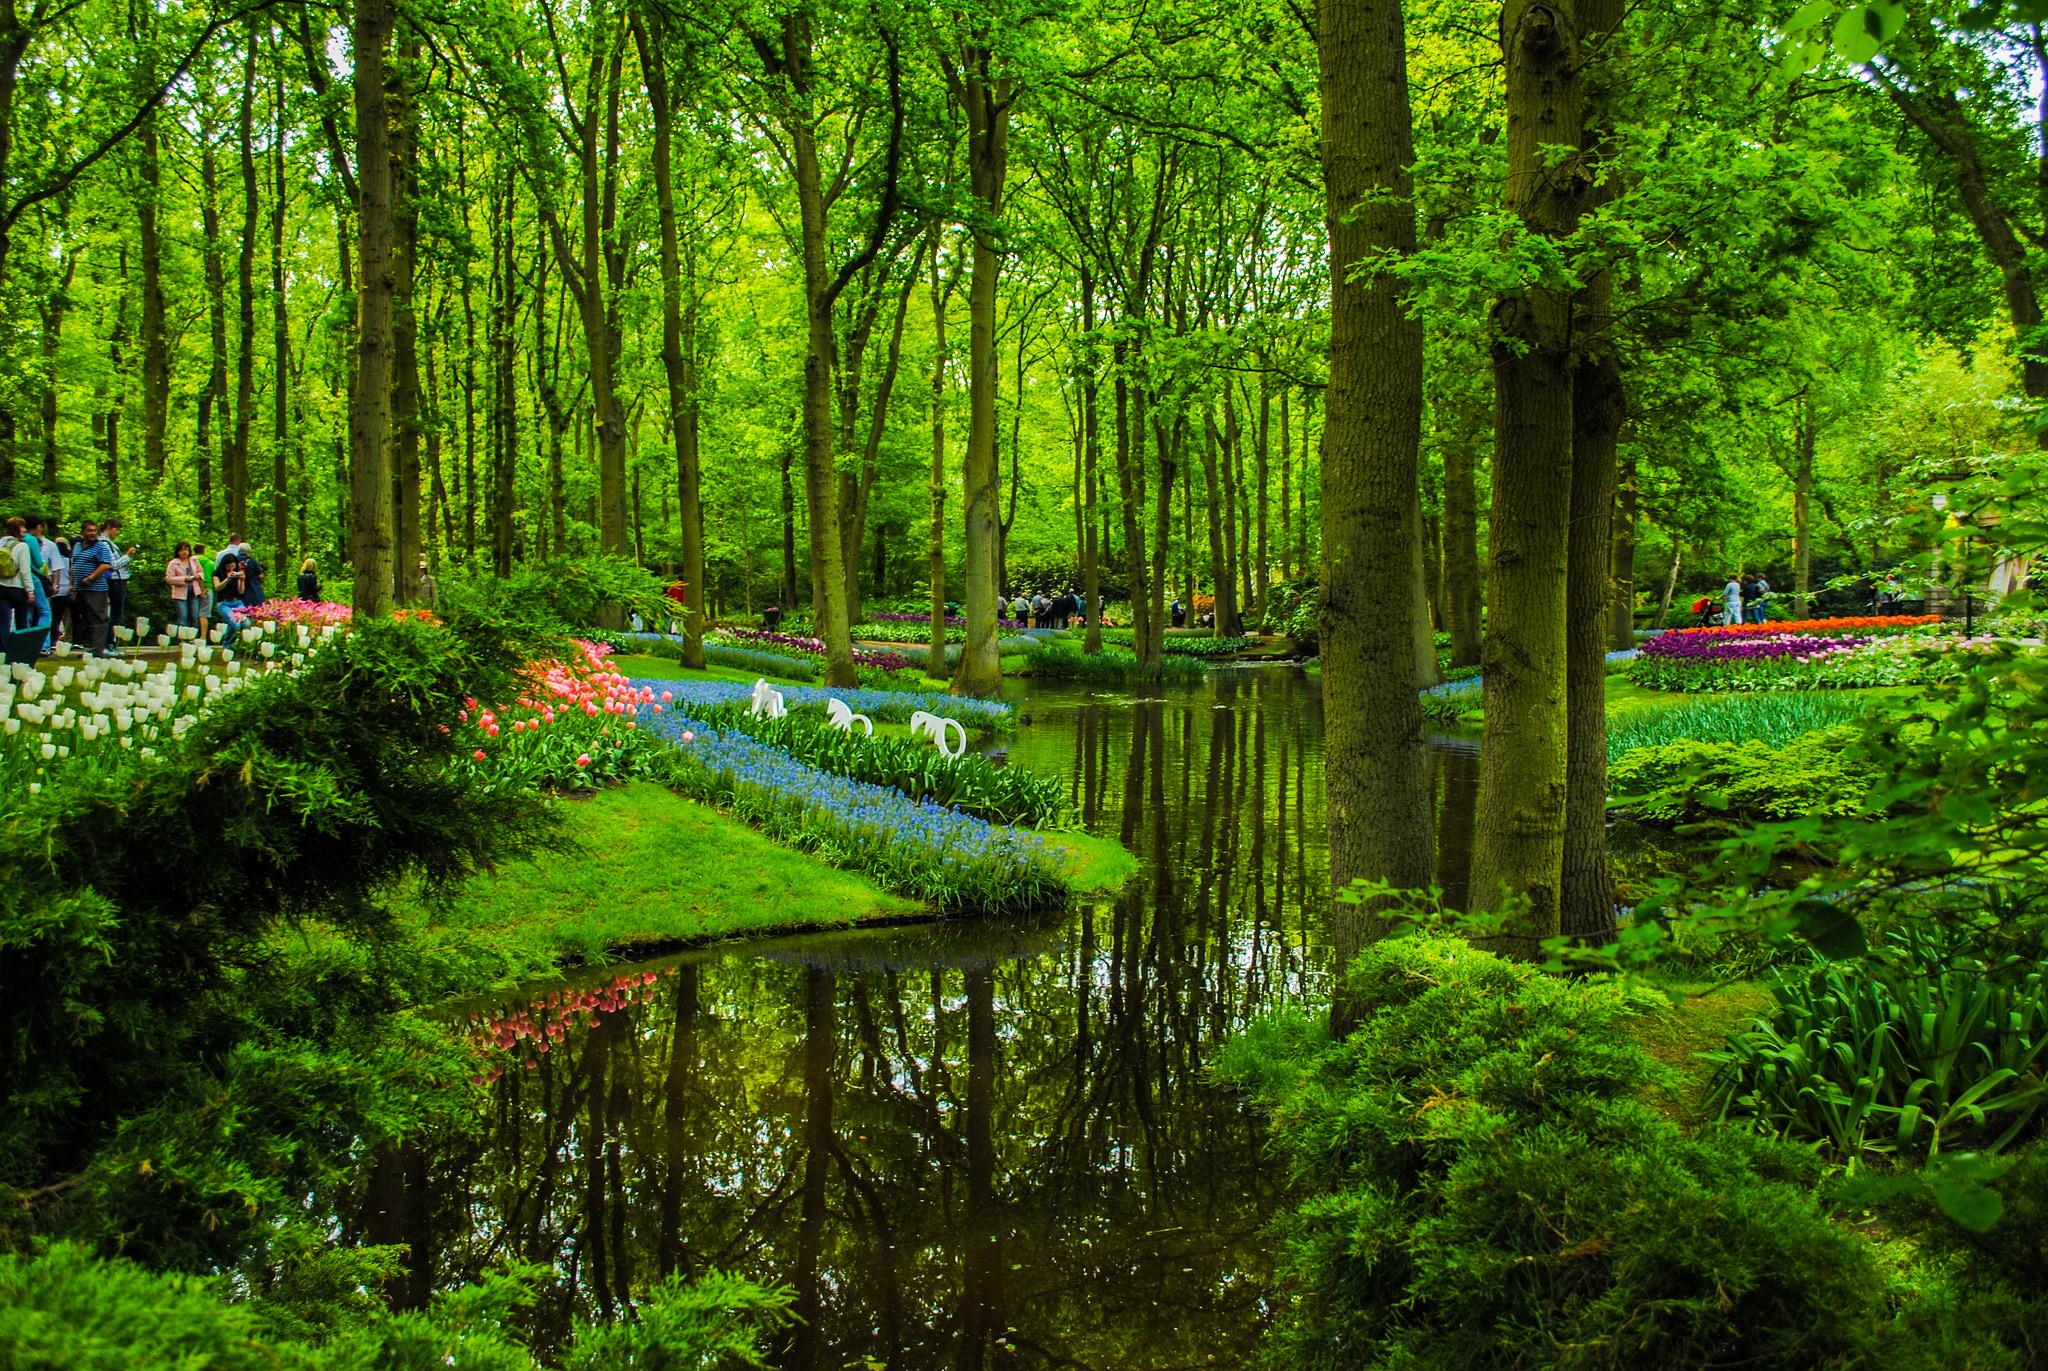 Guide to Visiting Amsterdam's Keukenhof Gardens